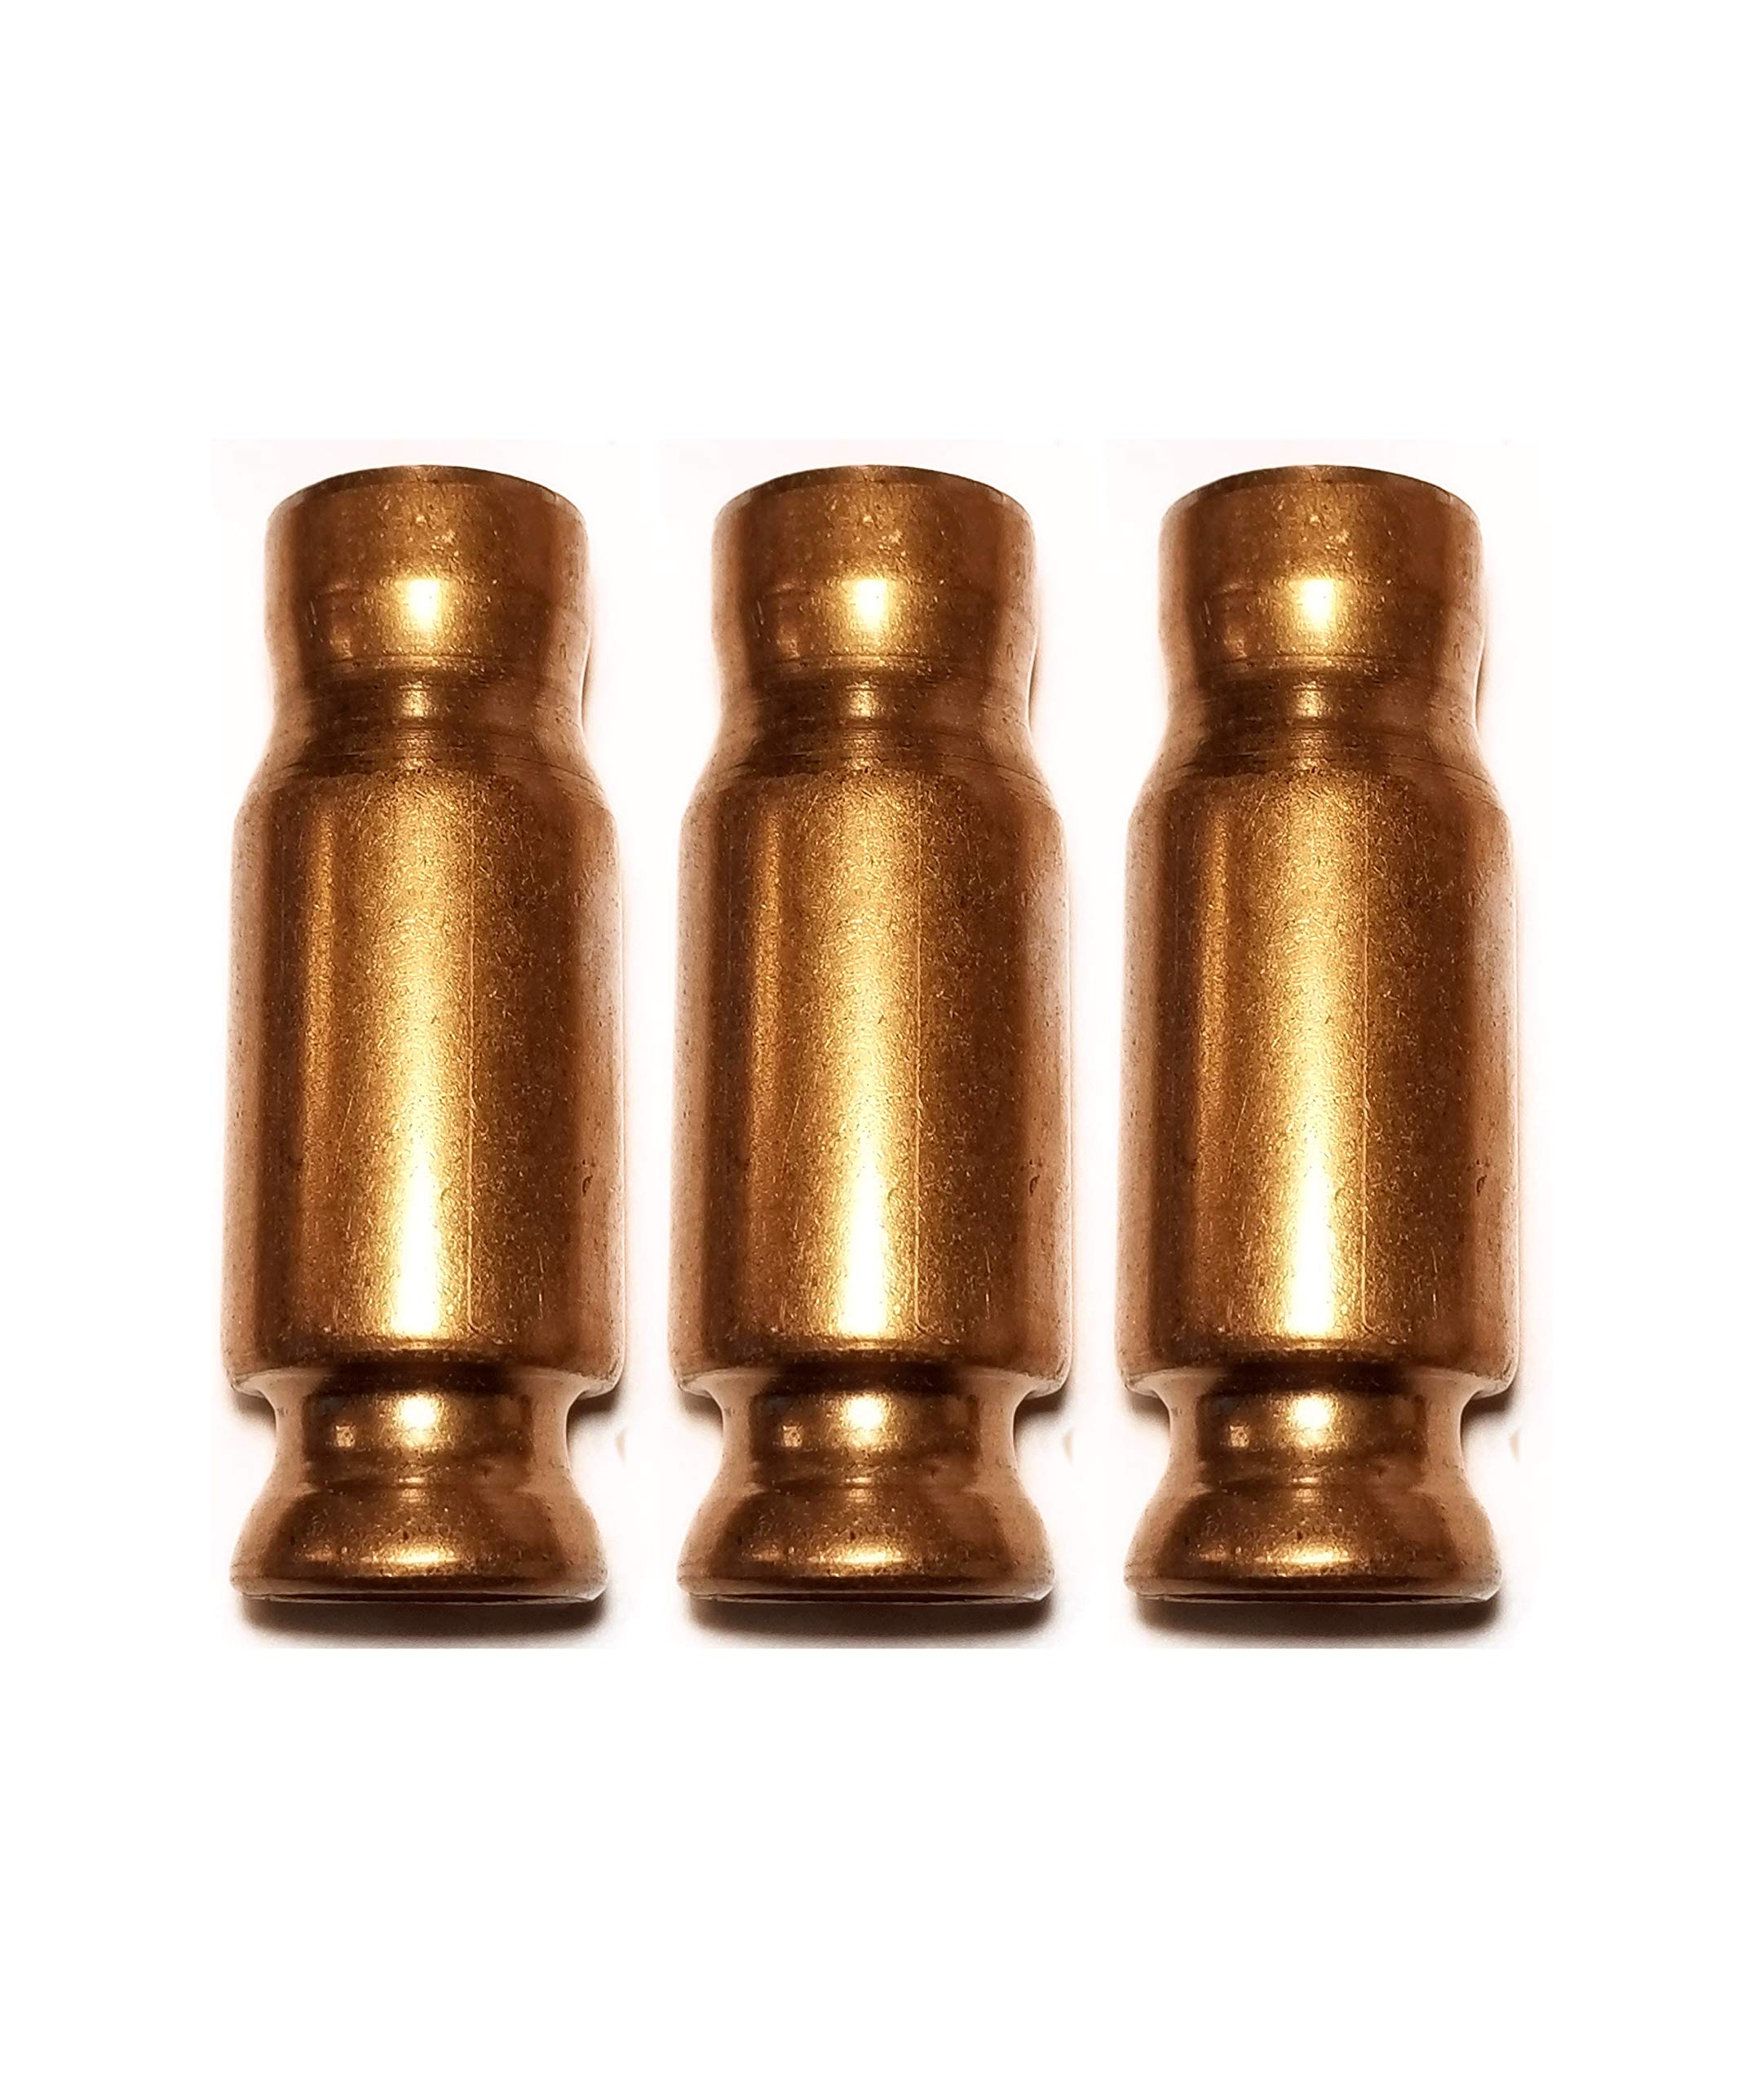 Jiggler Express Shaker Siphon Self-Priming 1'' XXL Copper Pump Head - 3 pc Set (No Hose)